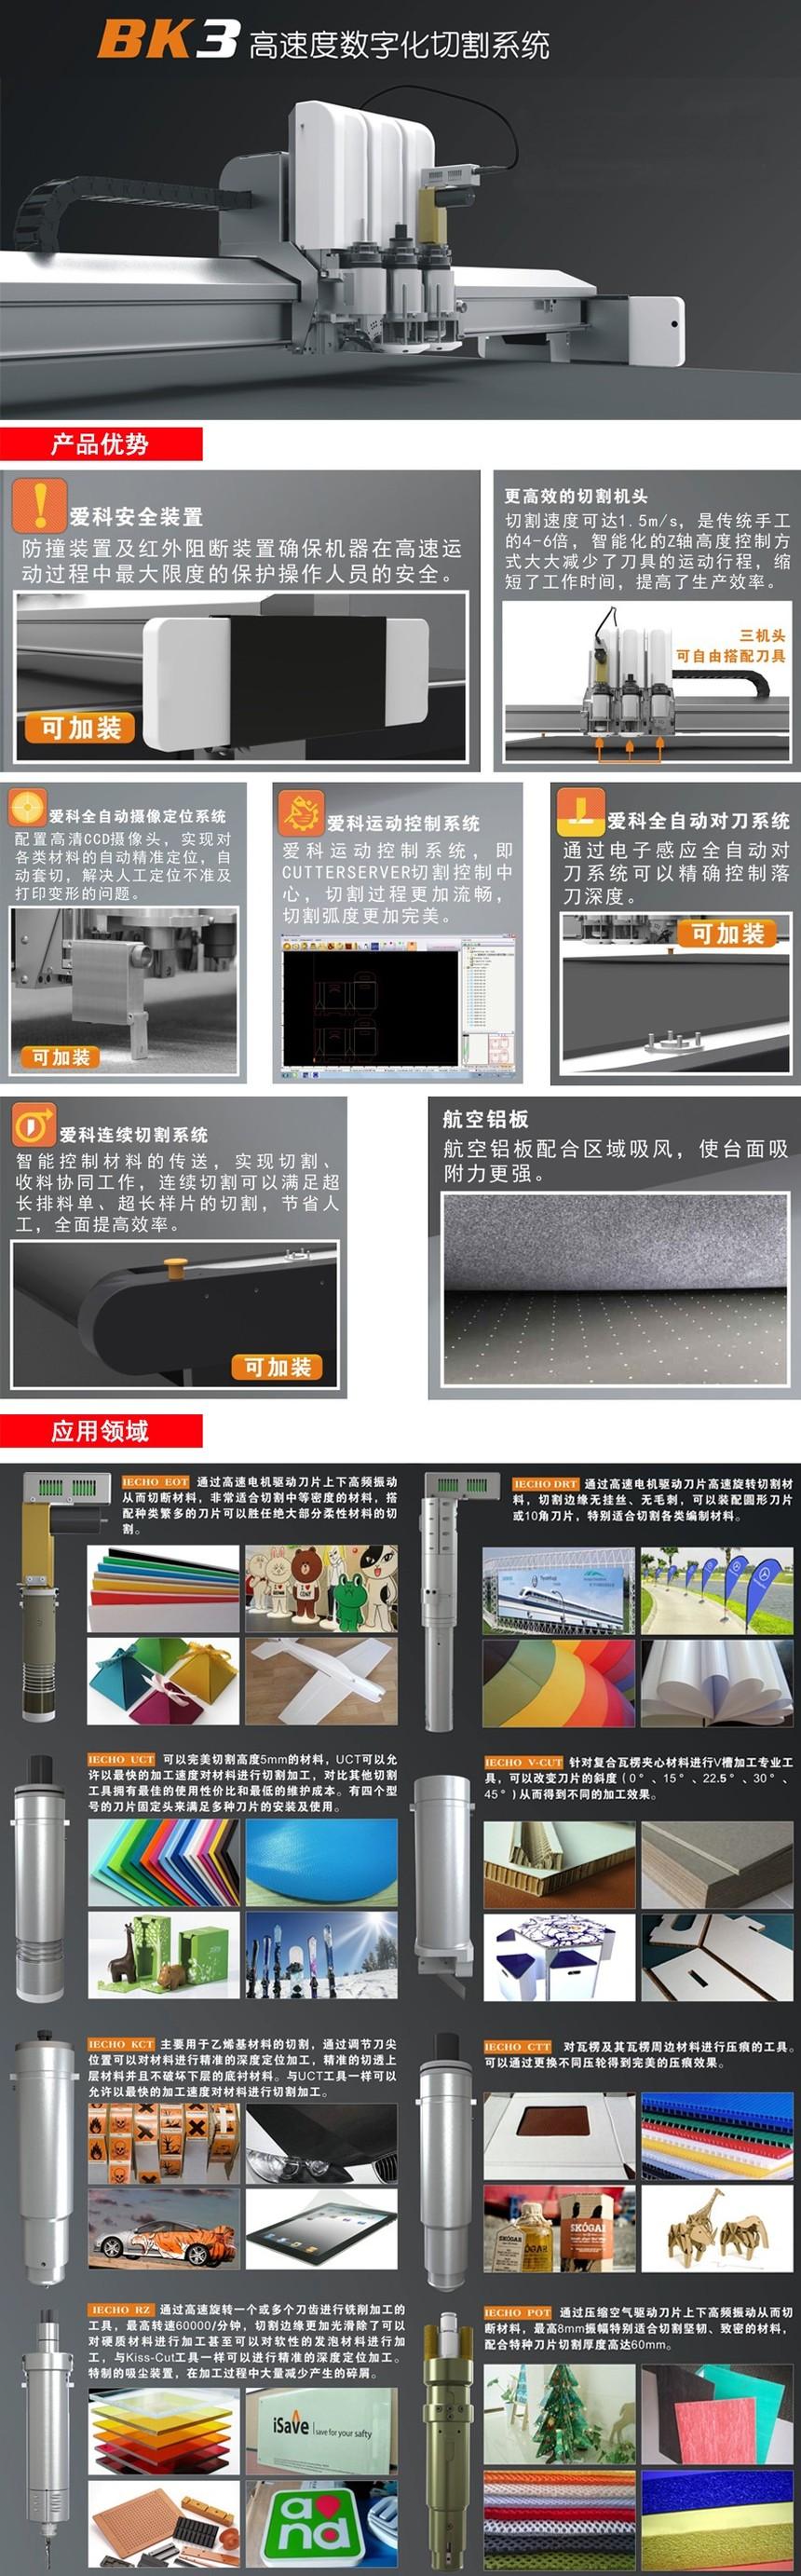 BK3-高速数字化切割系统..jpg